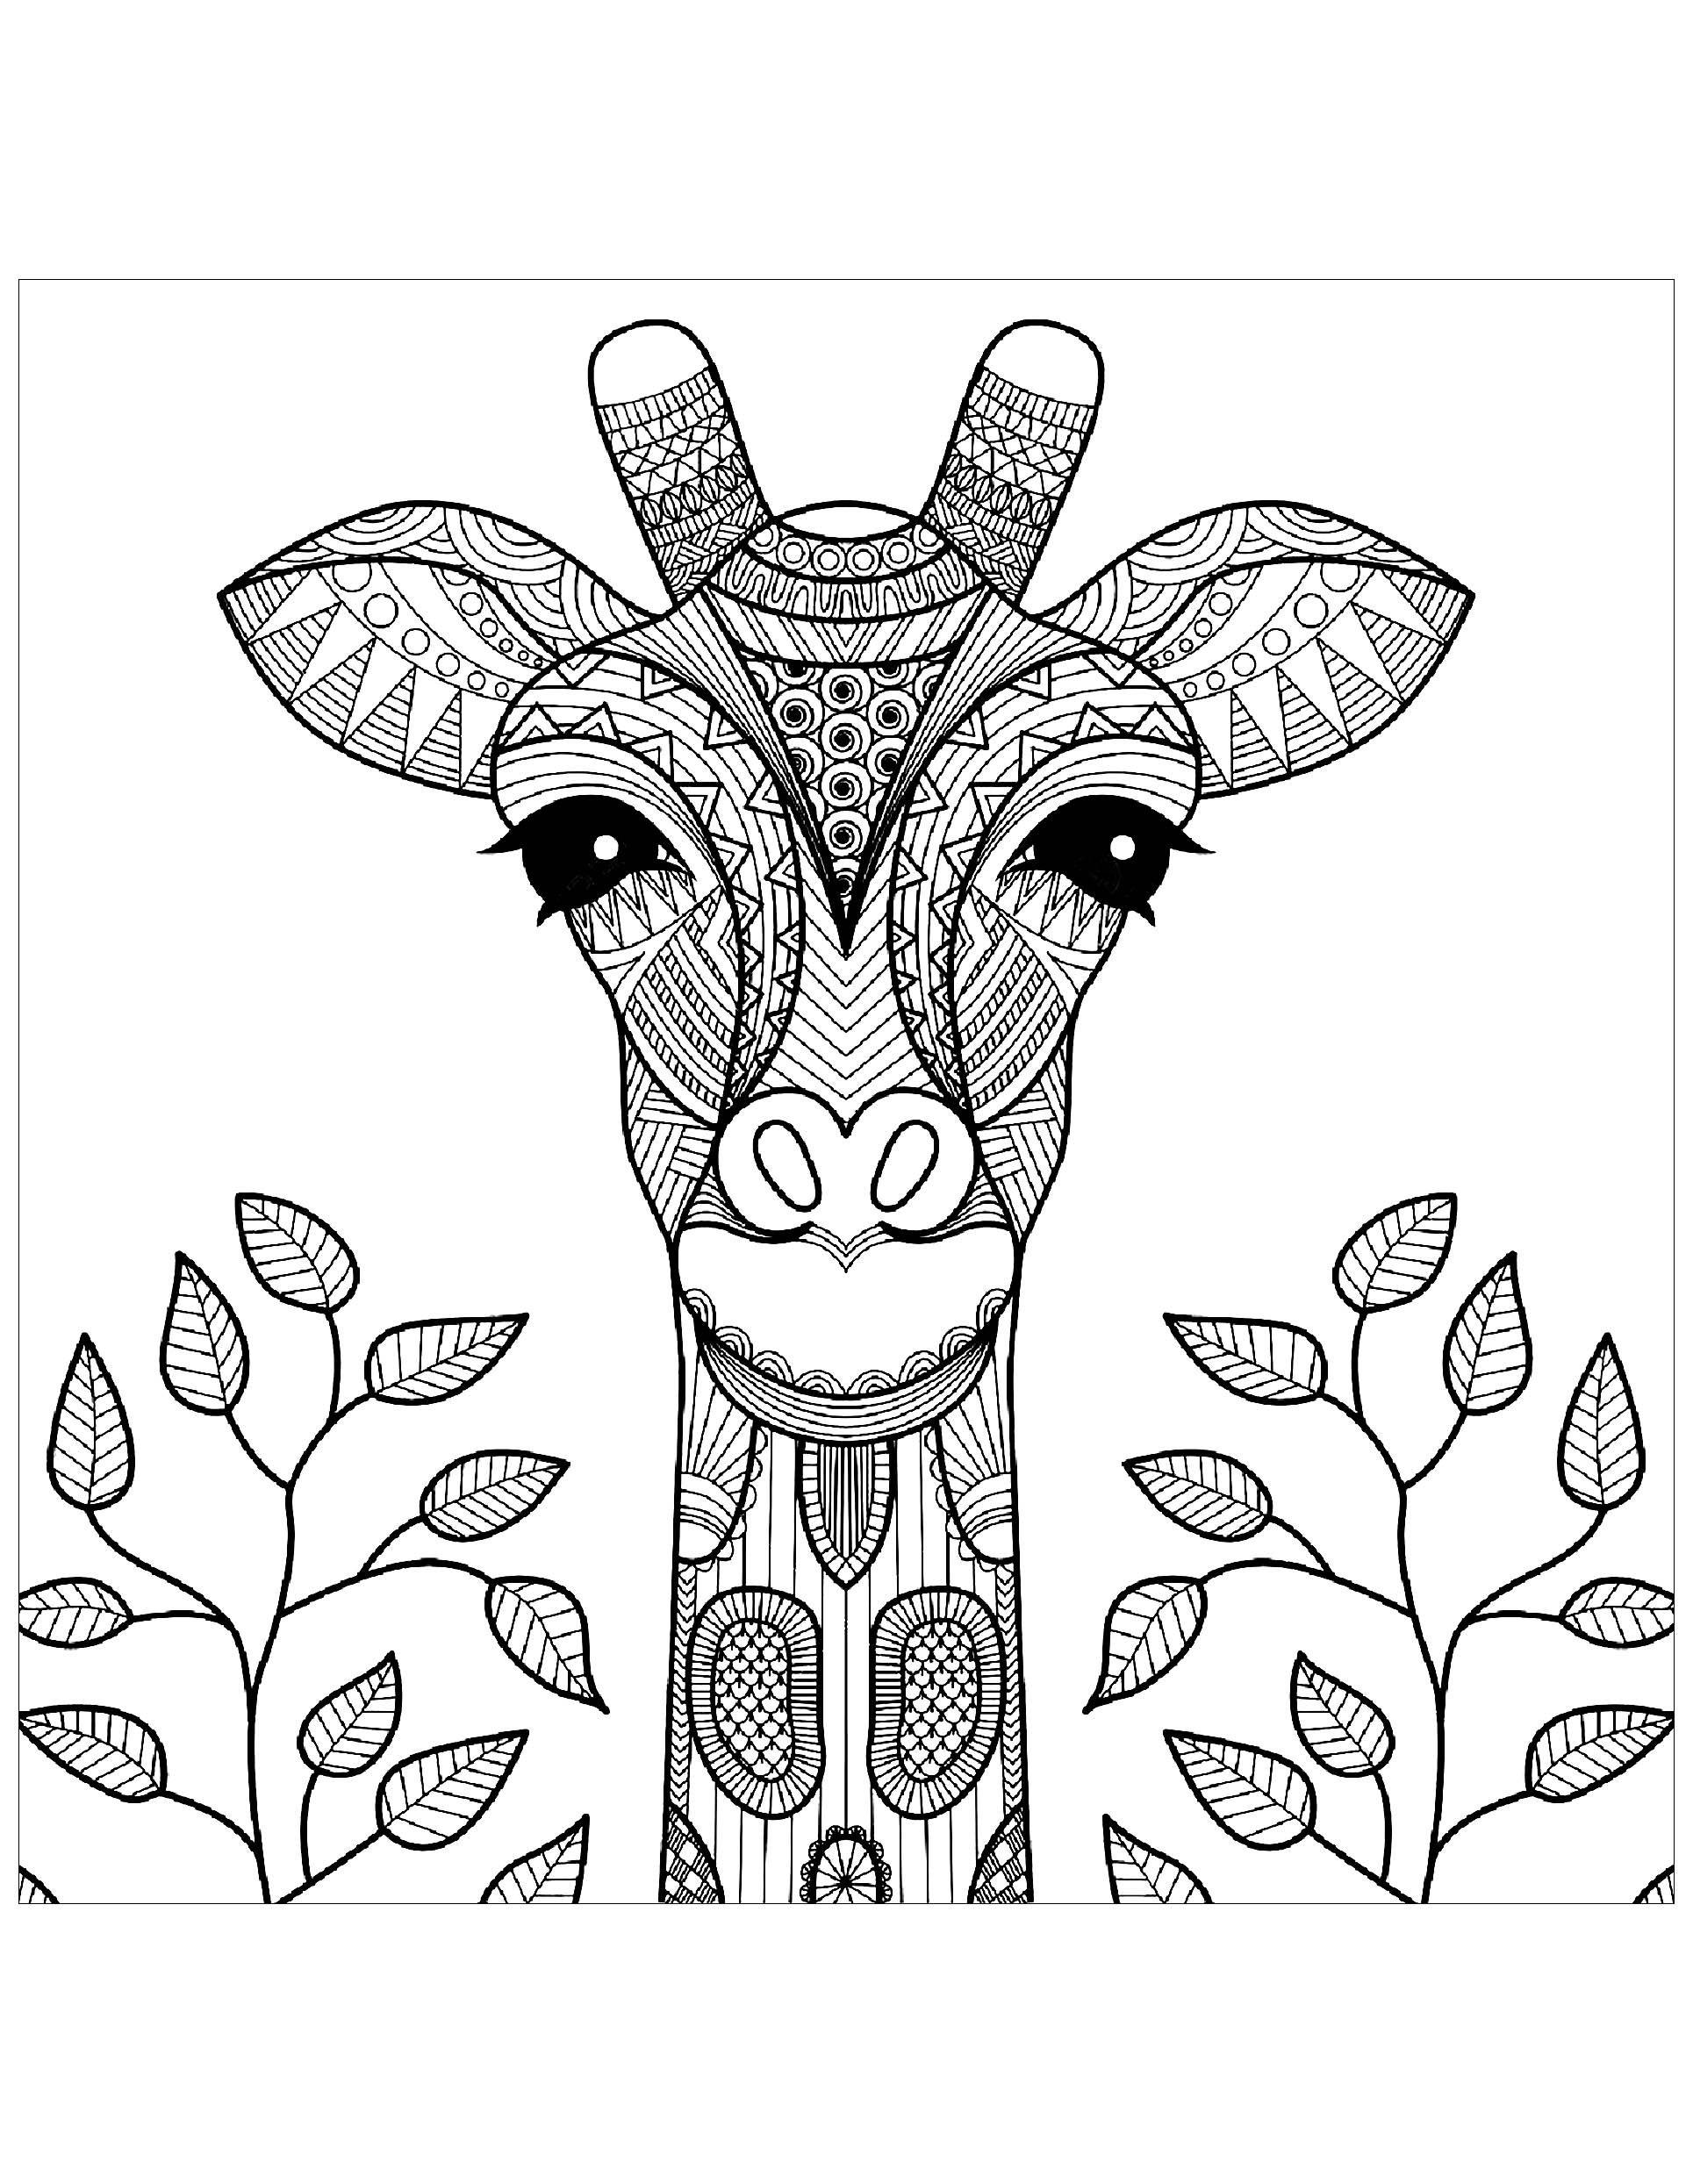 Giraffe Head With Leaves Giraffes Coloring Pages For Adults Justcolor Giraffe Coloring Pages Animal Coloring Books Coloring Books